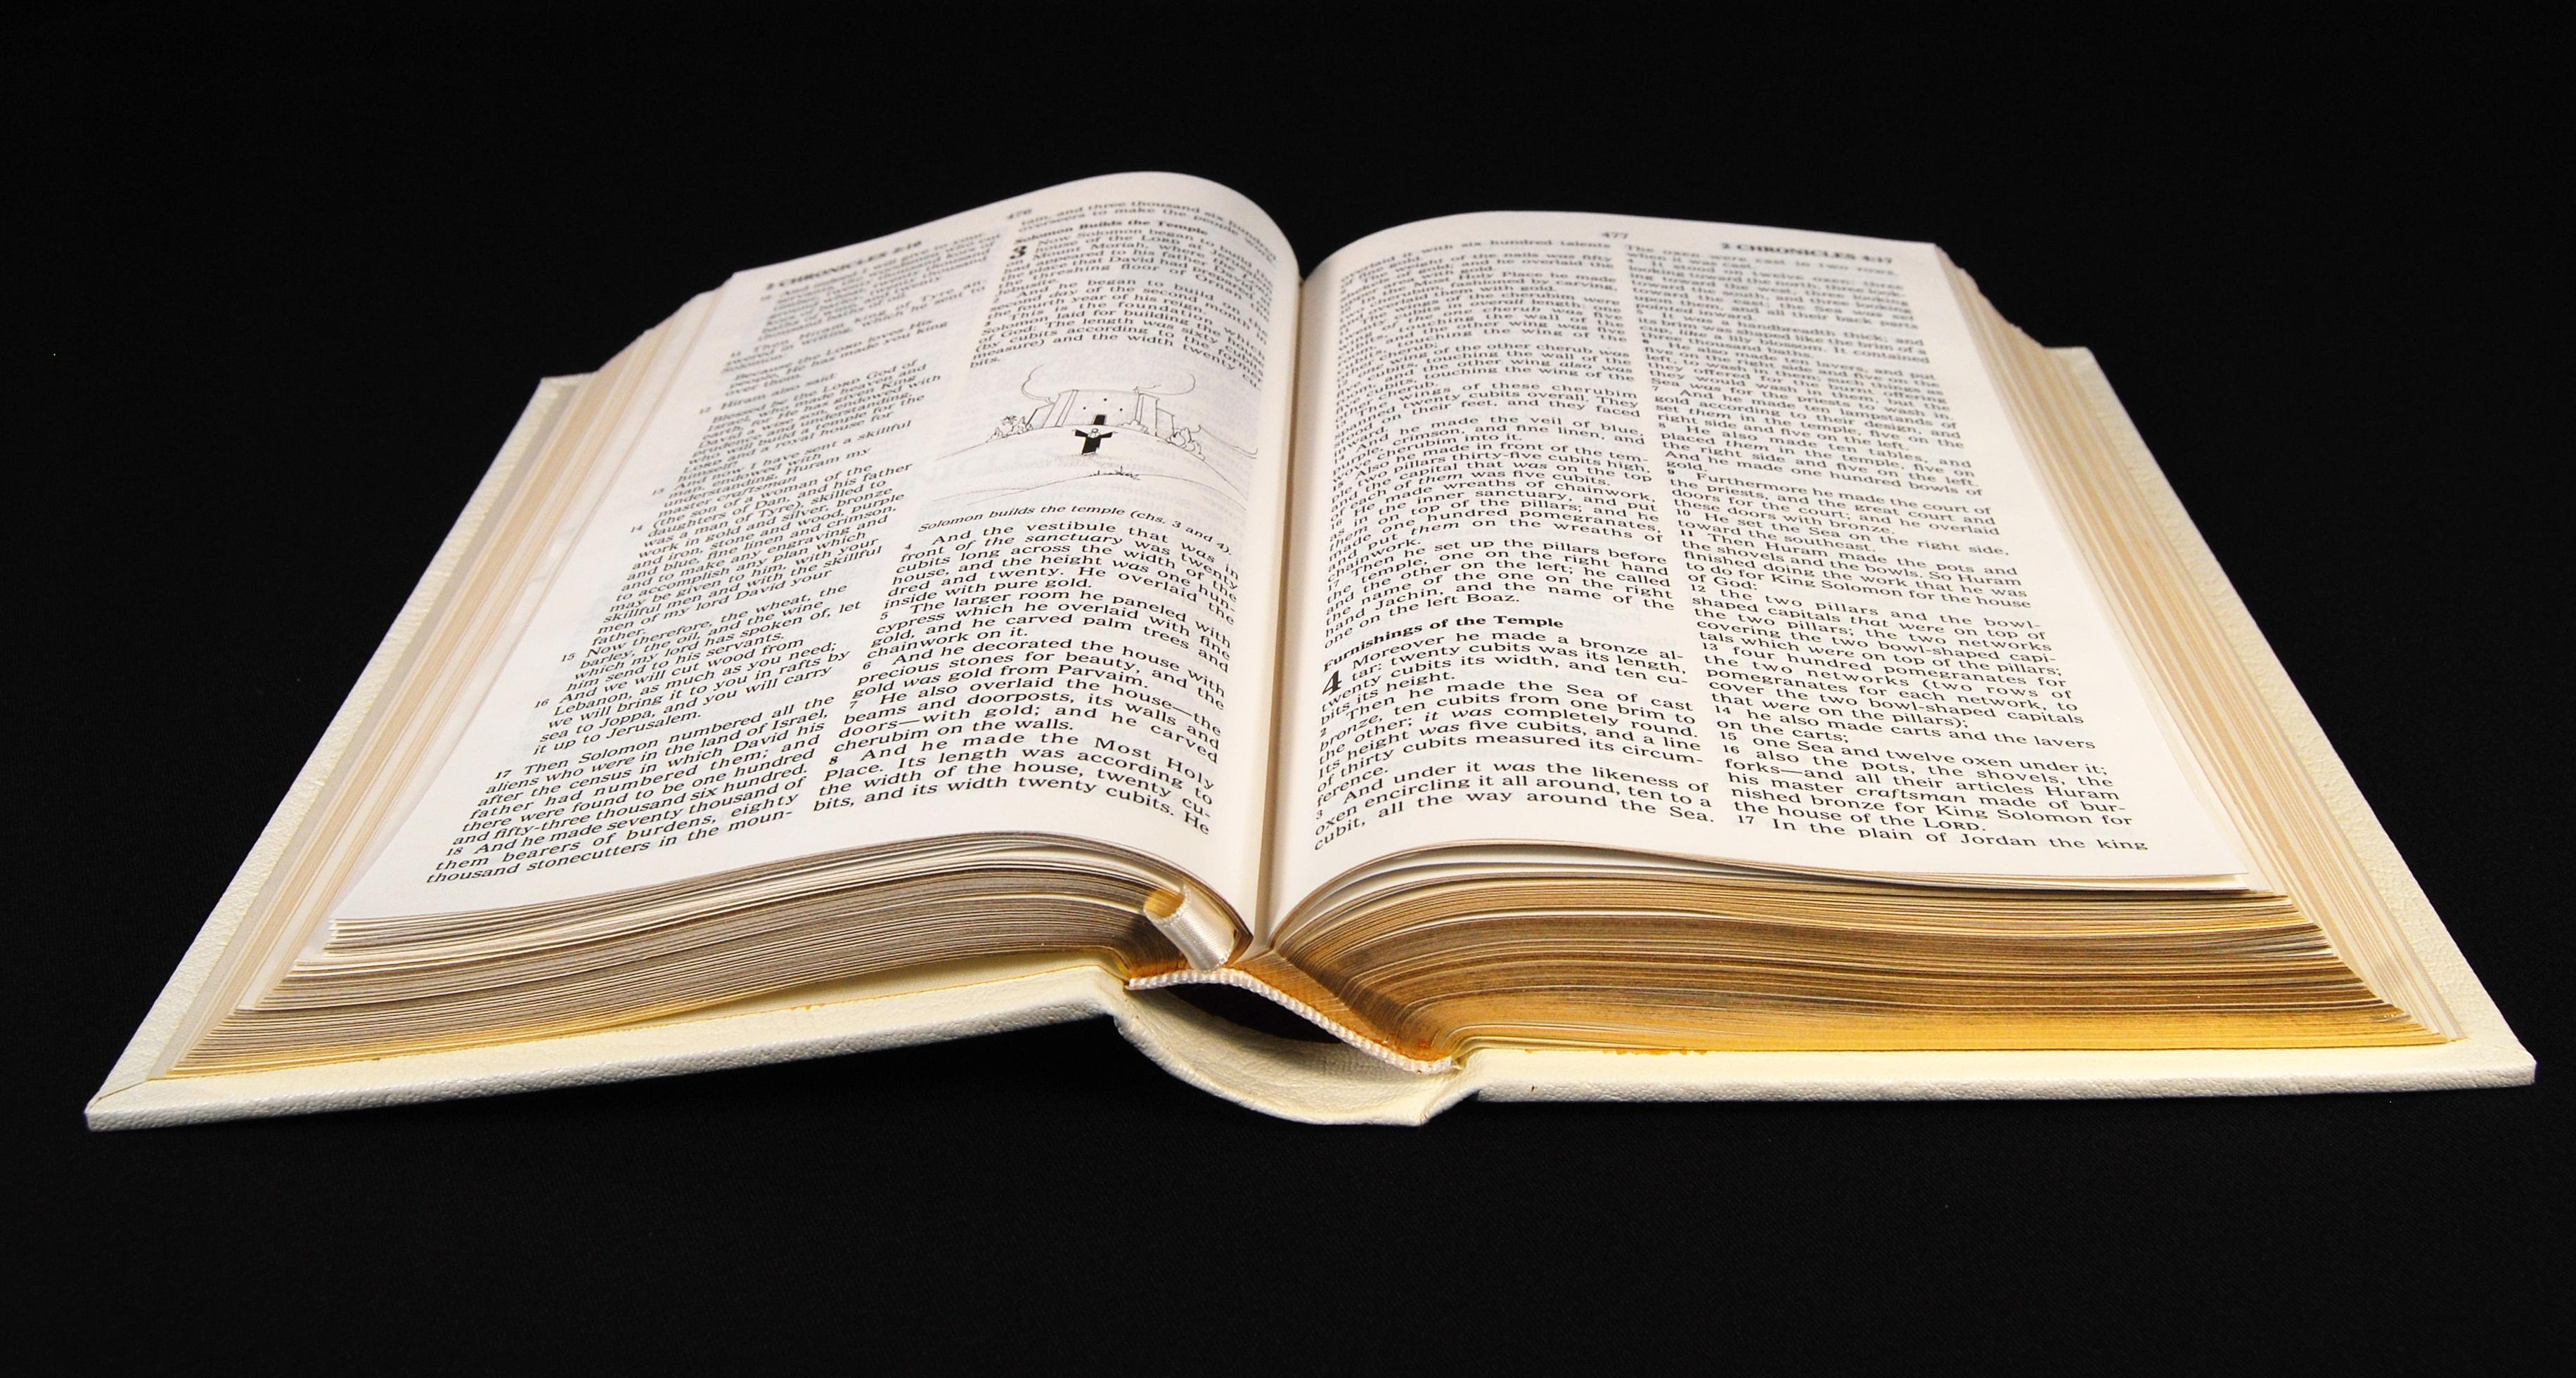 1019642 63590745 - Kategorie slov s vylhaným novým významem